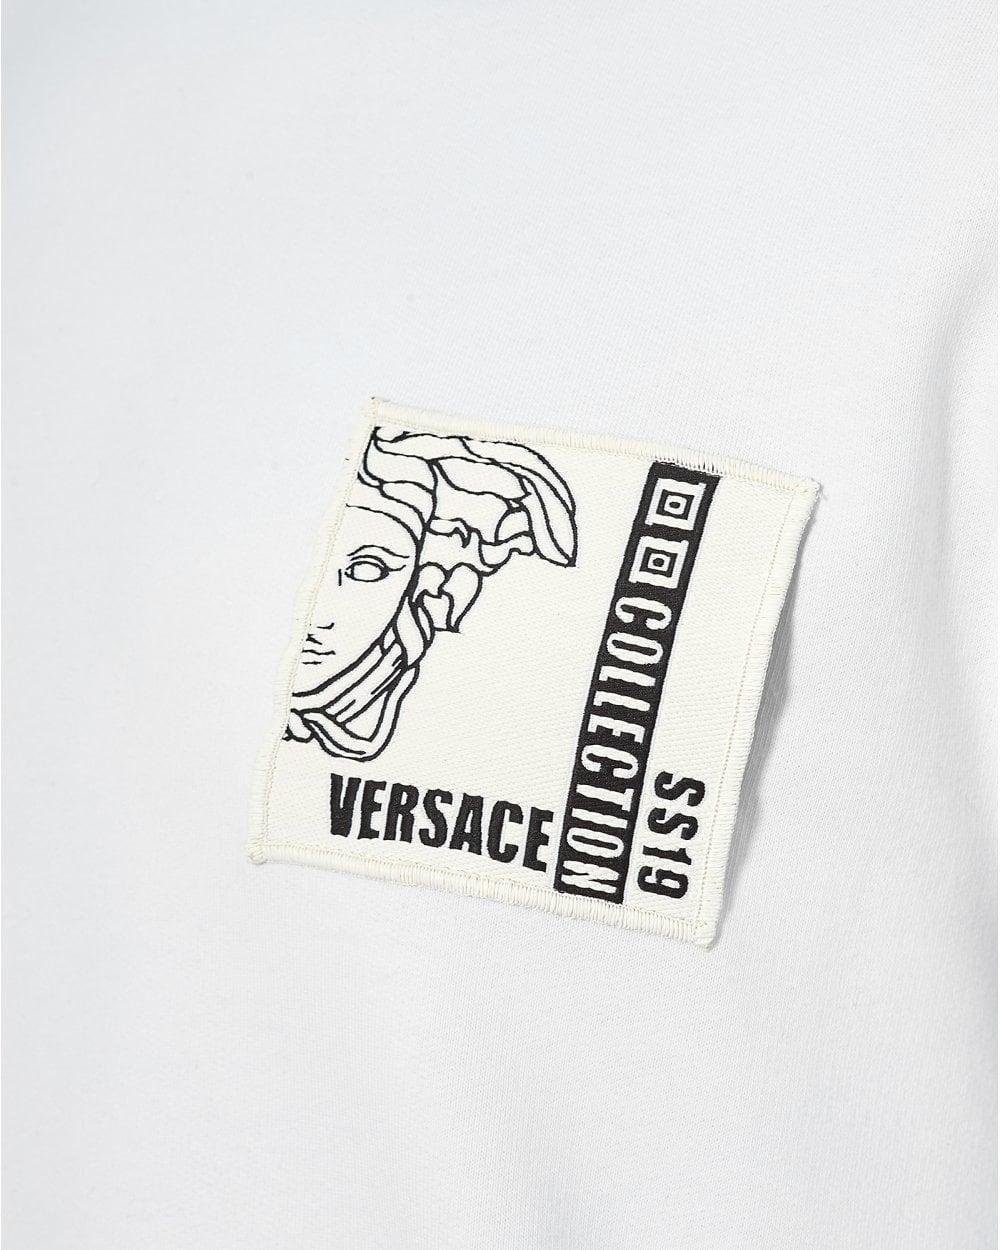 Versace Collection Sweat Chest Sweatshirt Patch White Mens 8Tn8wCpq 6041cbb7cea